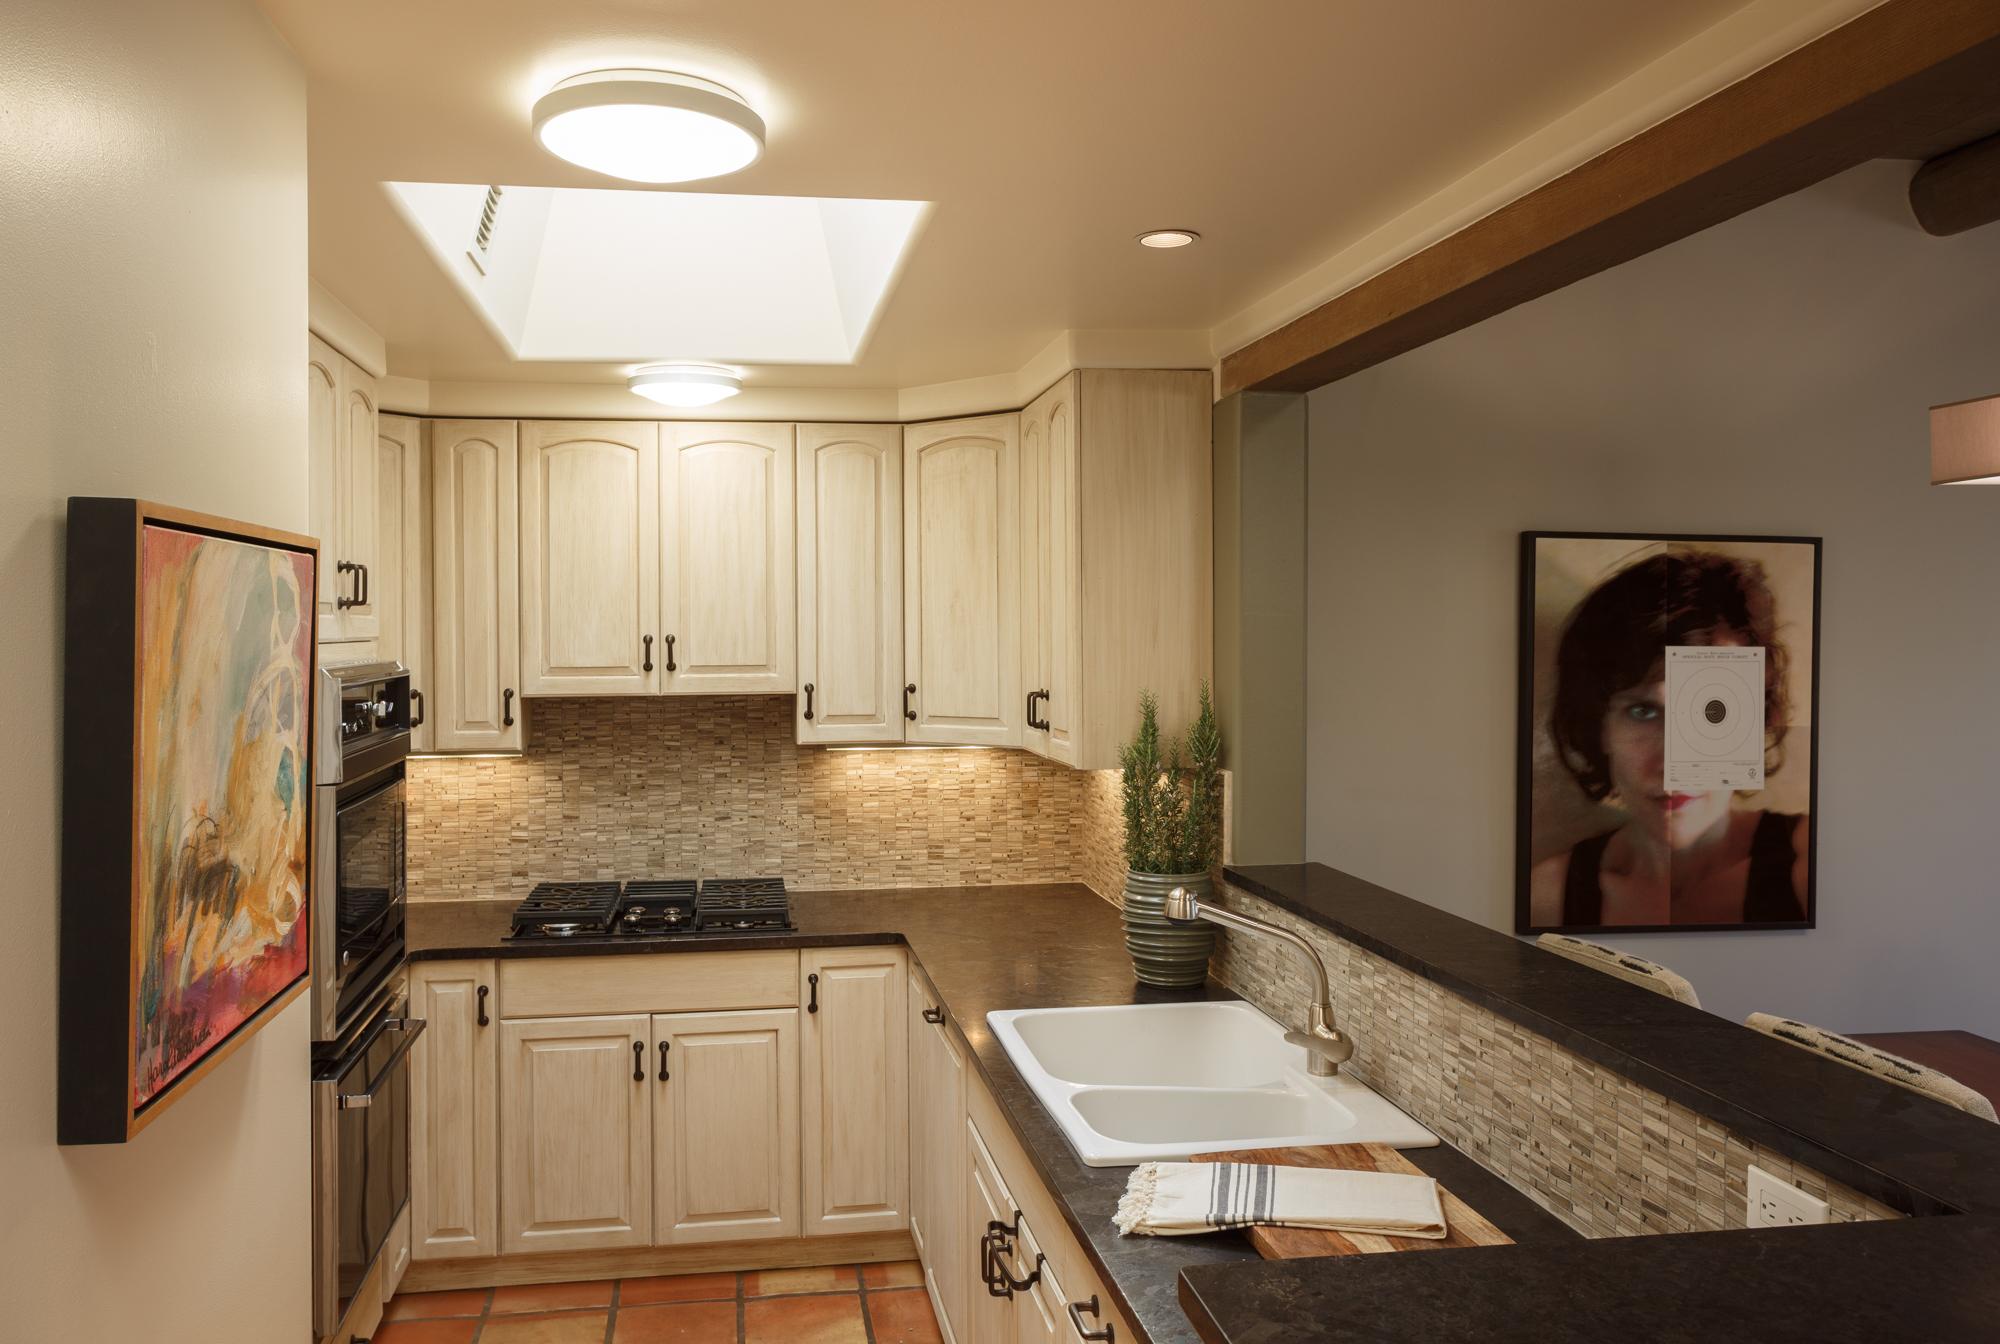 small kitchen design, remodel, style, Santa Fe